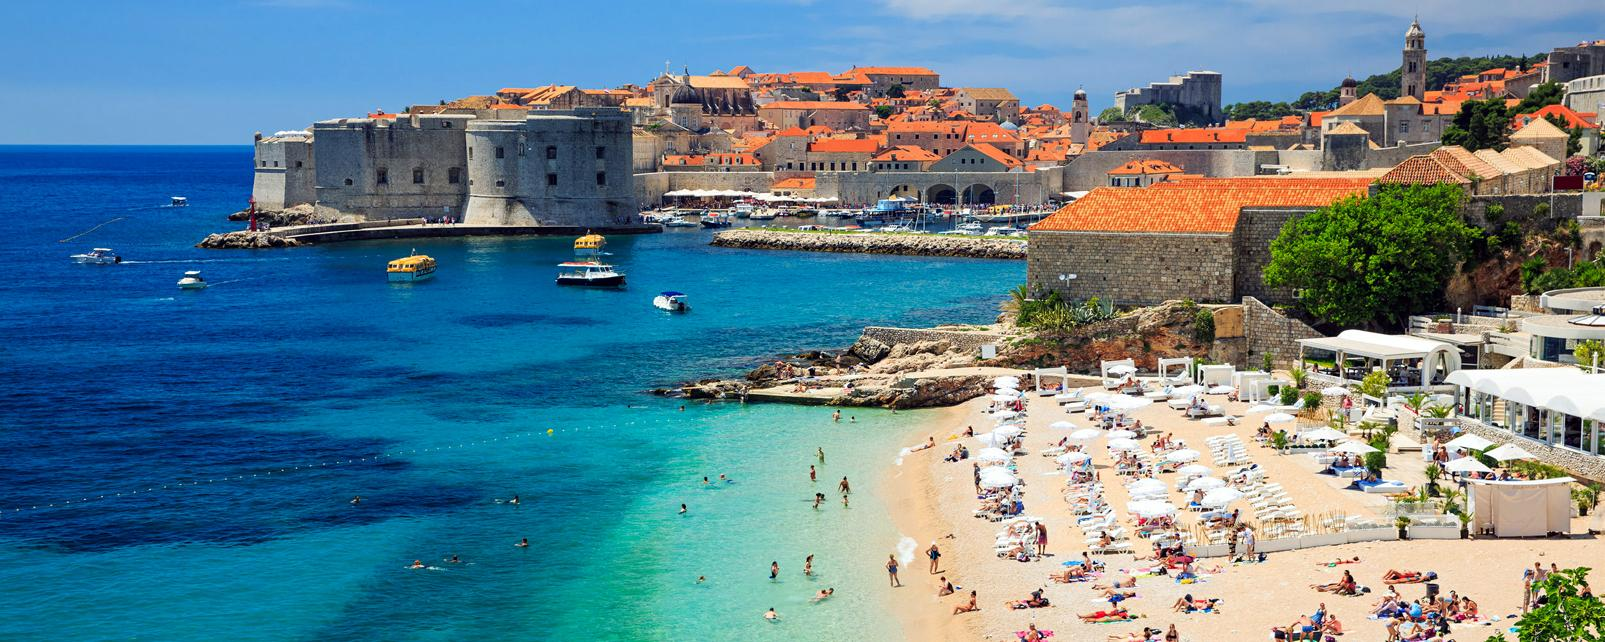 Europe, Croatie, Dubrovnik, ville, plage, baignade, forteresse, mer,